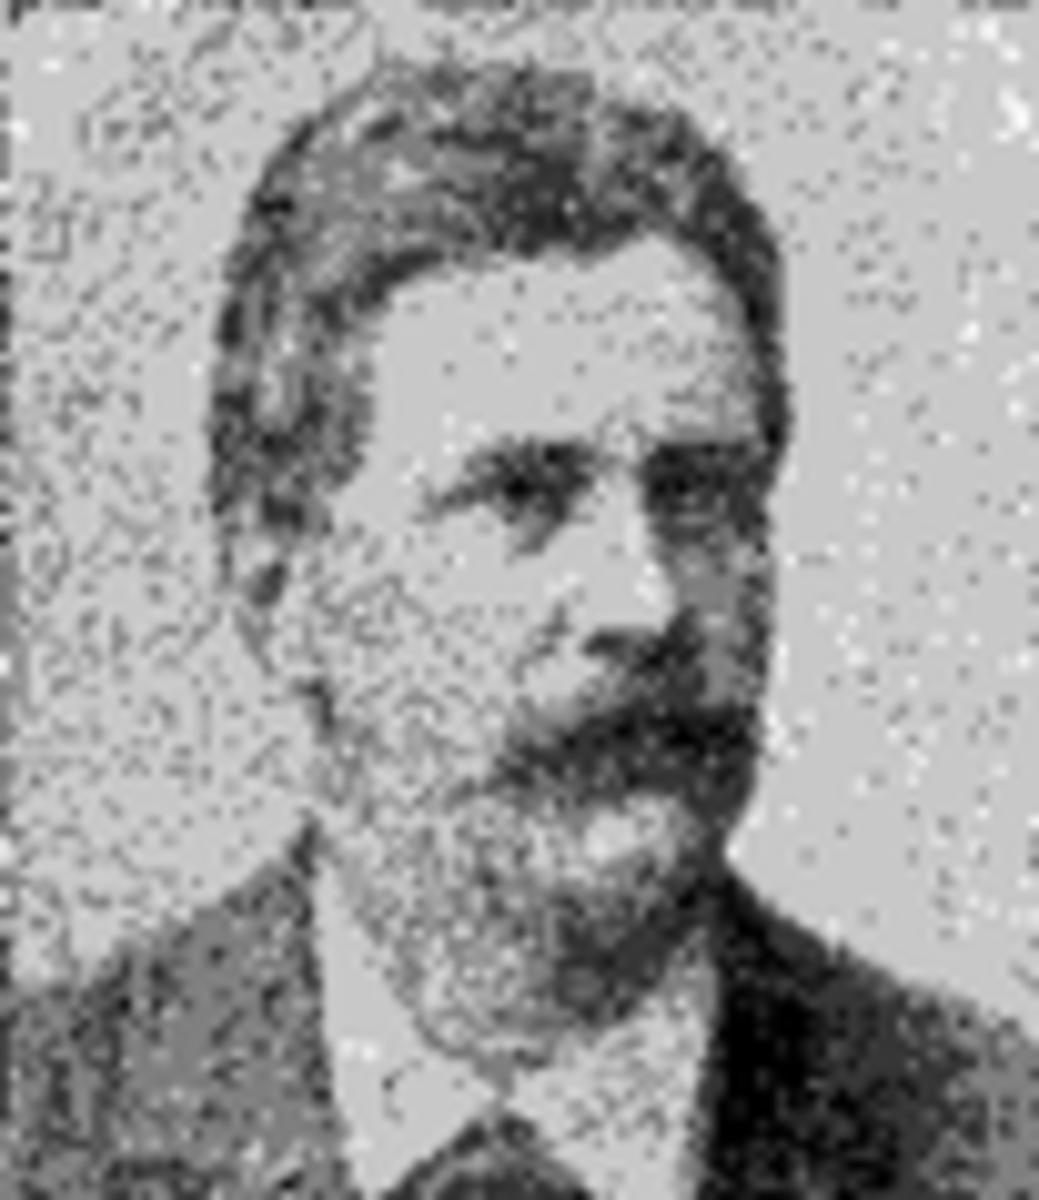 Arvid Hogbom